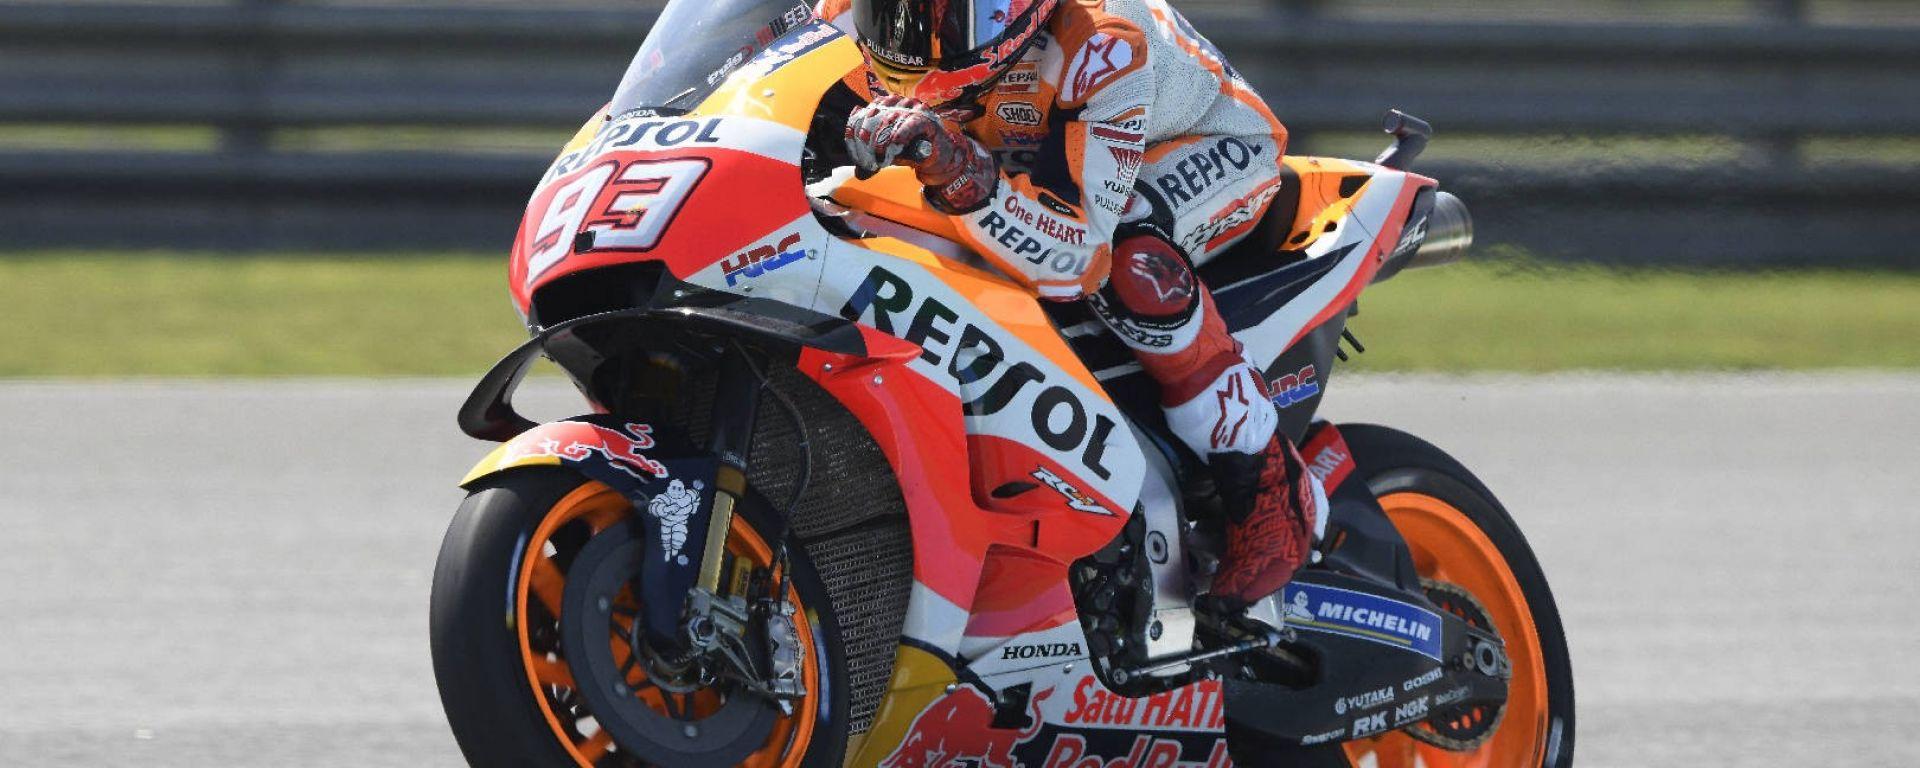 GP Thailandia, Buriram. Marquez in pole davanti a Rossi